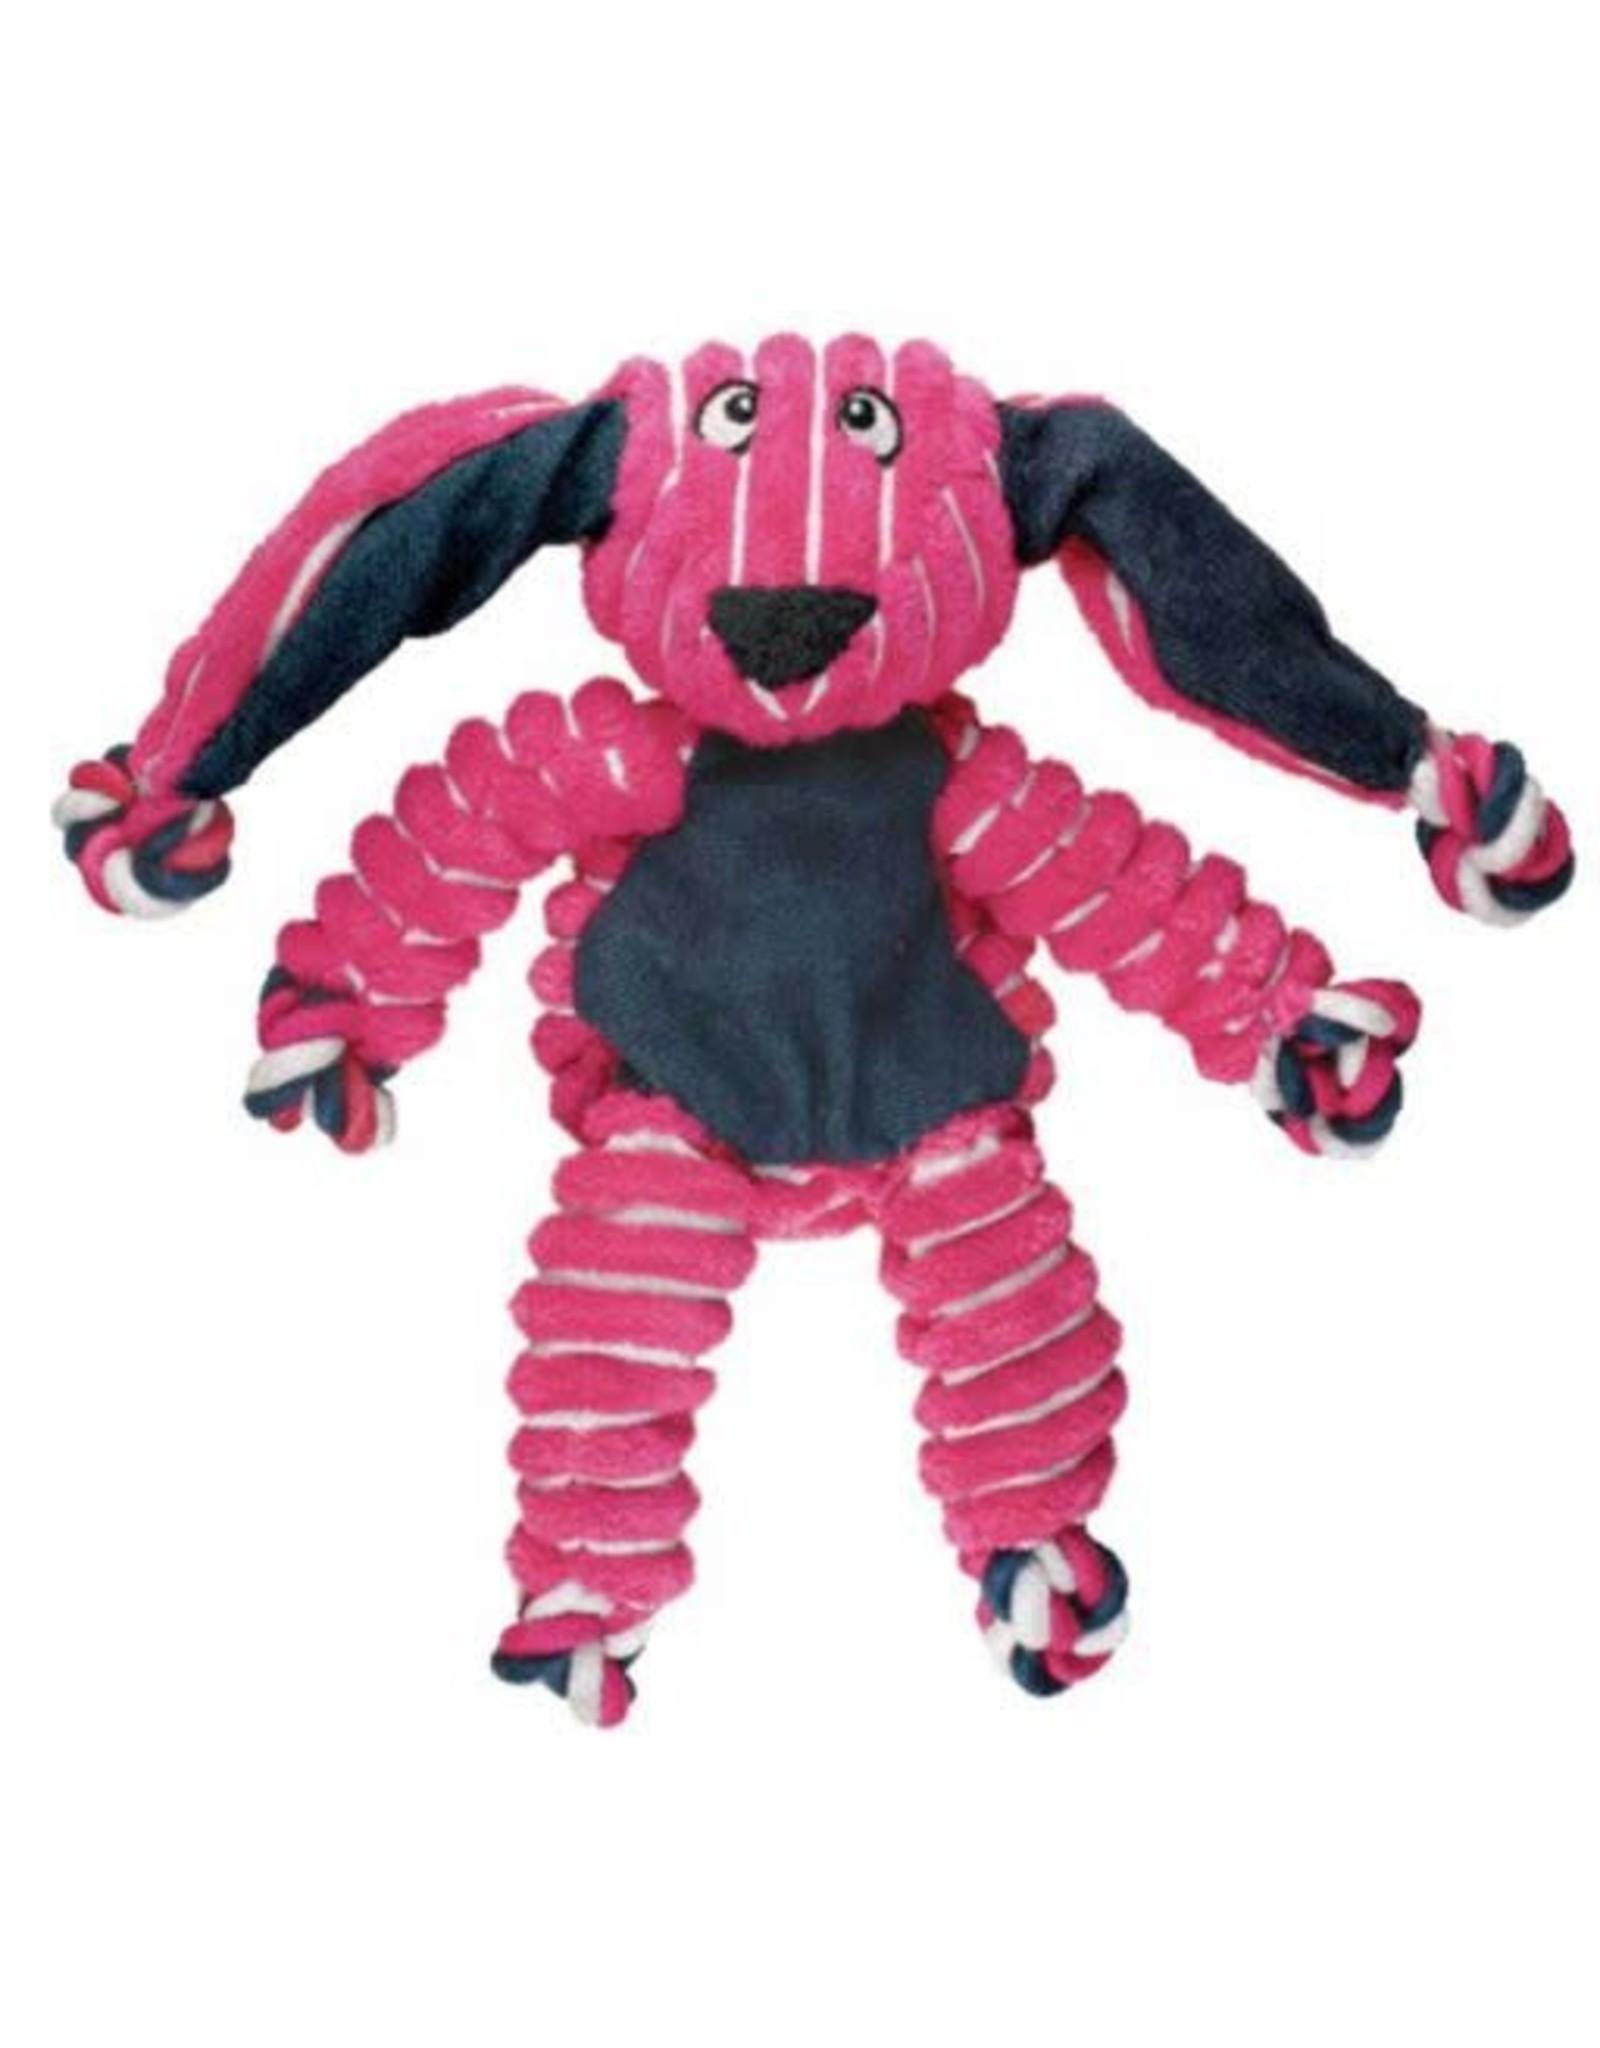 KONG Dog Toy - Floppy Knots Bunny S/M